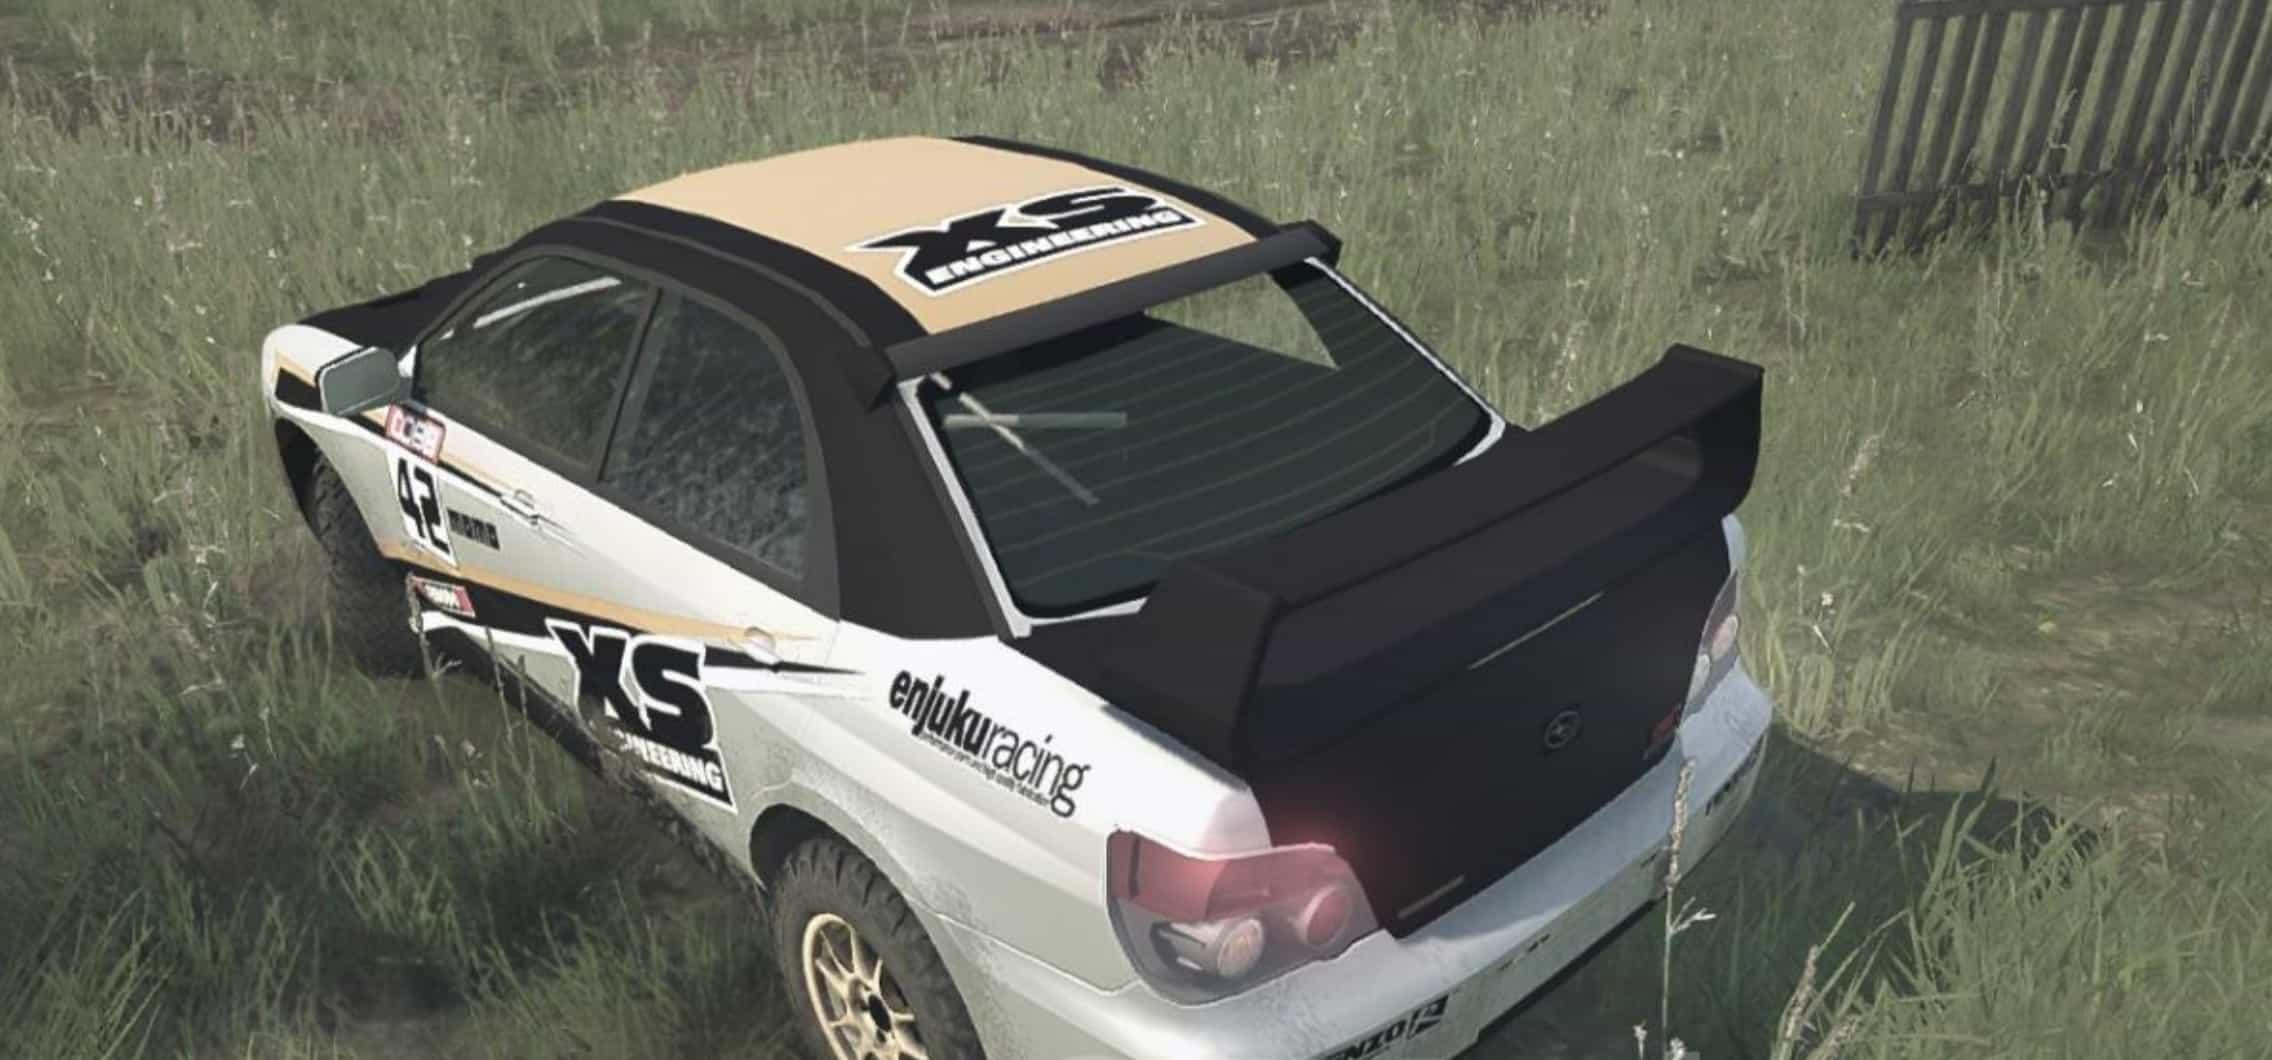 Subaru WRX STi 2007 Rally Car v08.04.18 - Spintires: MudRunner Mod